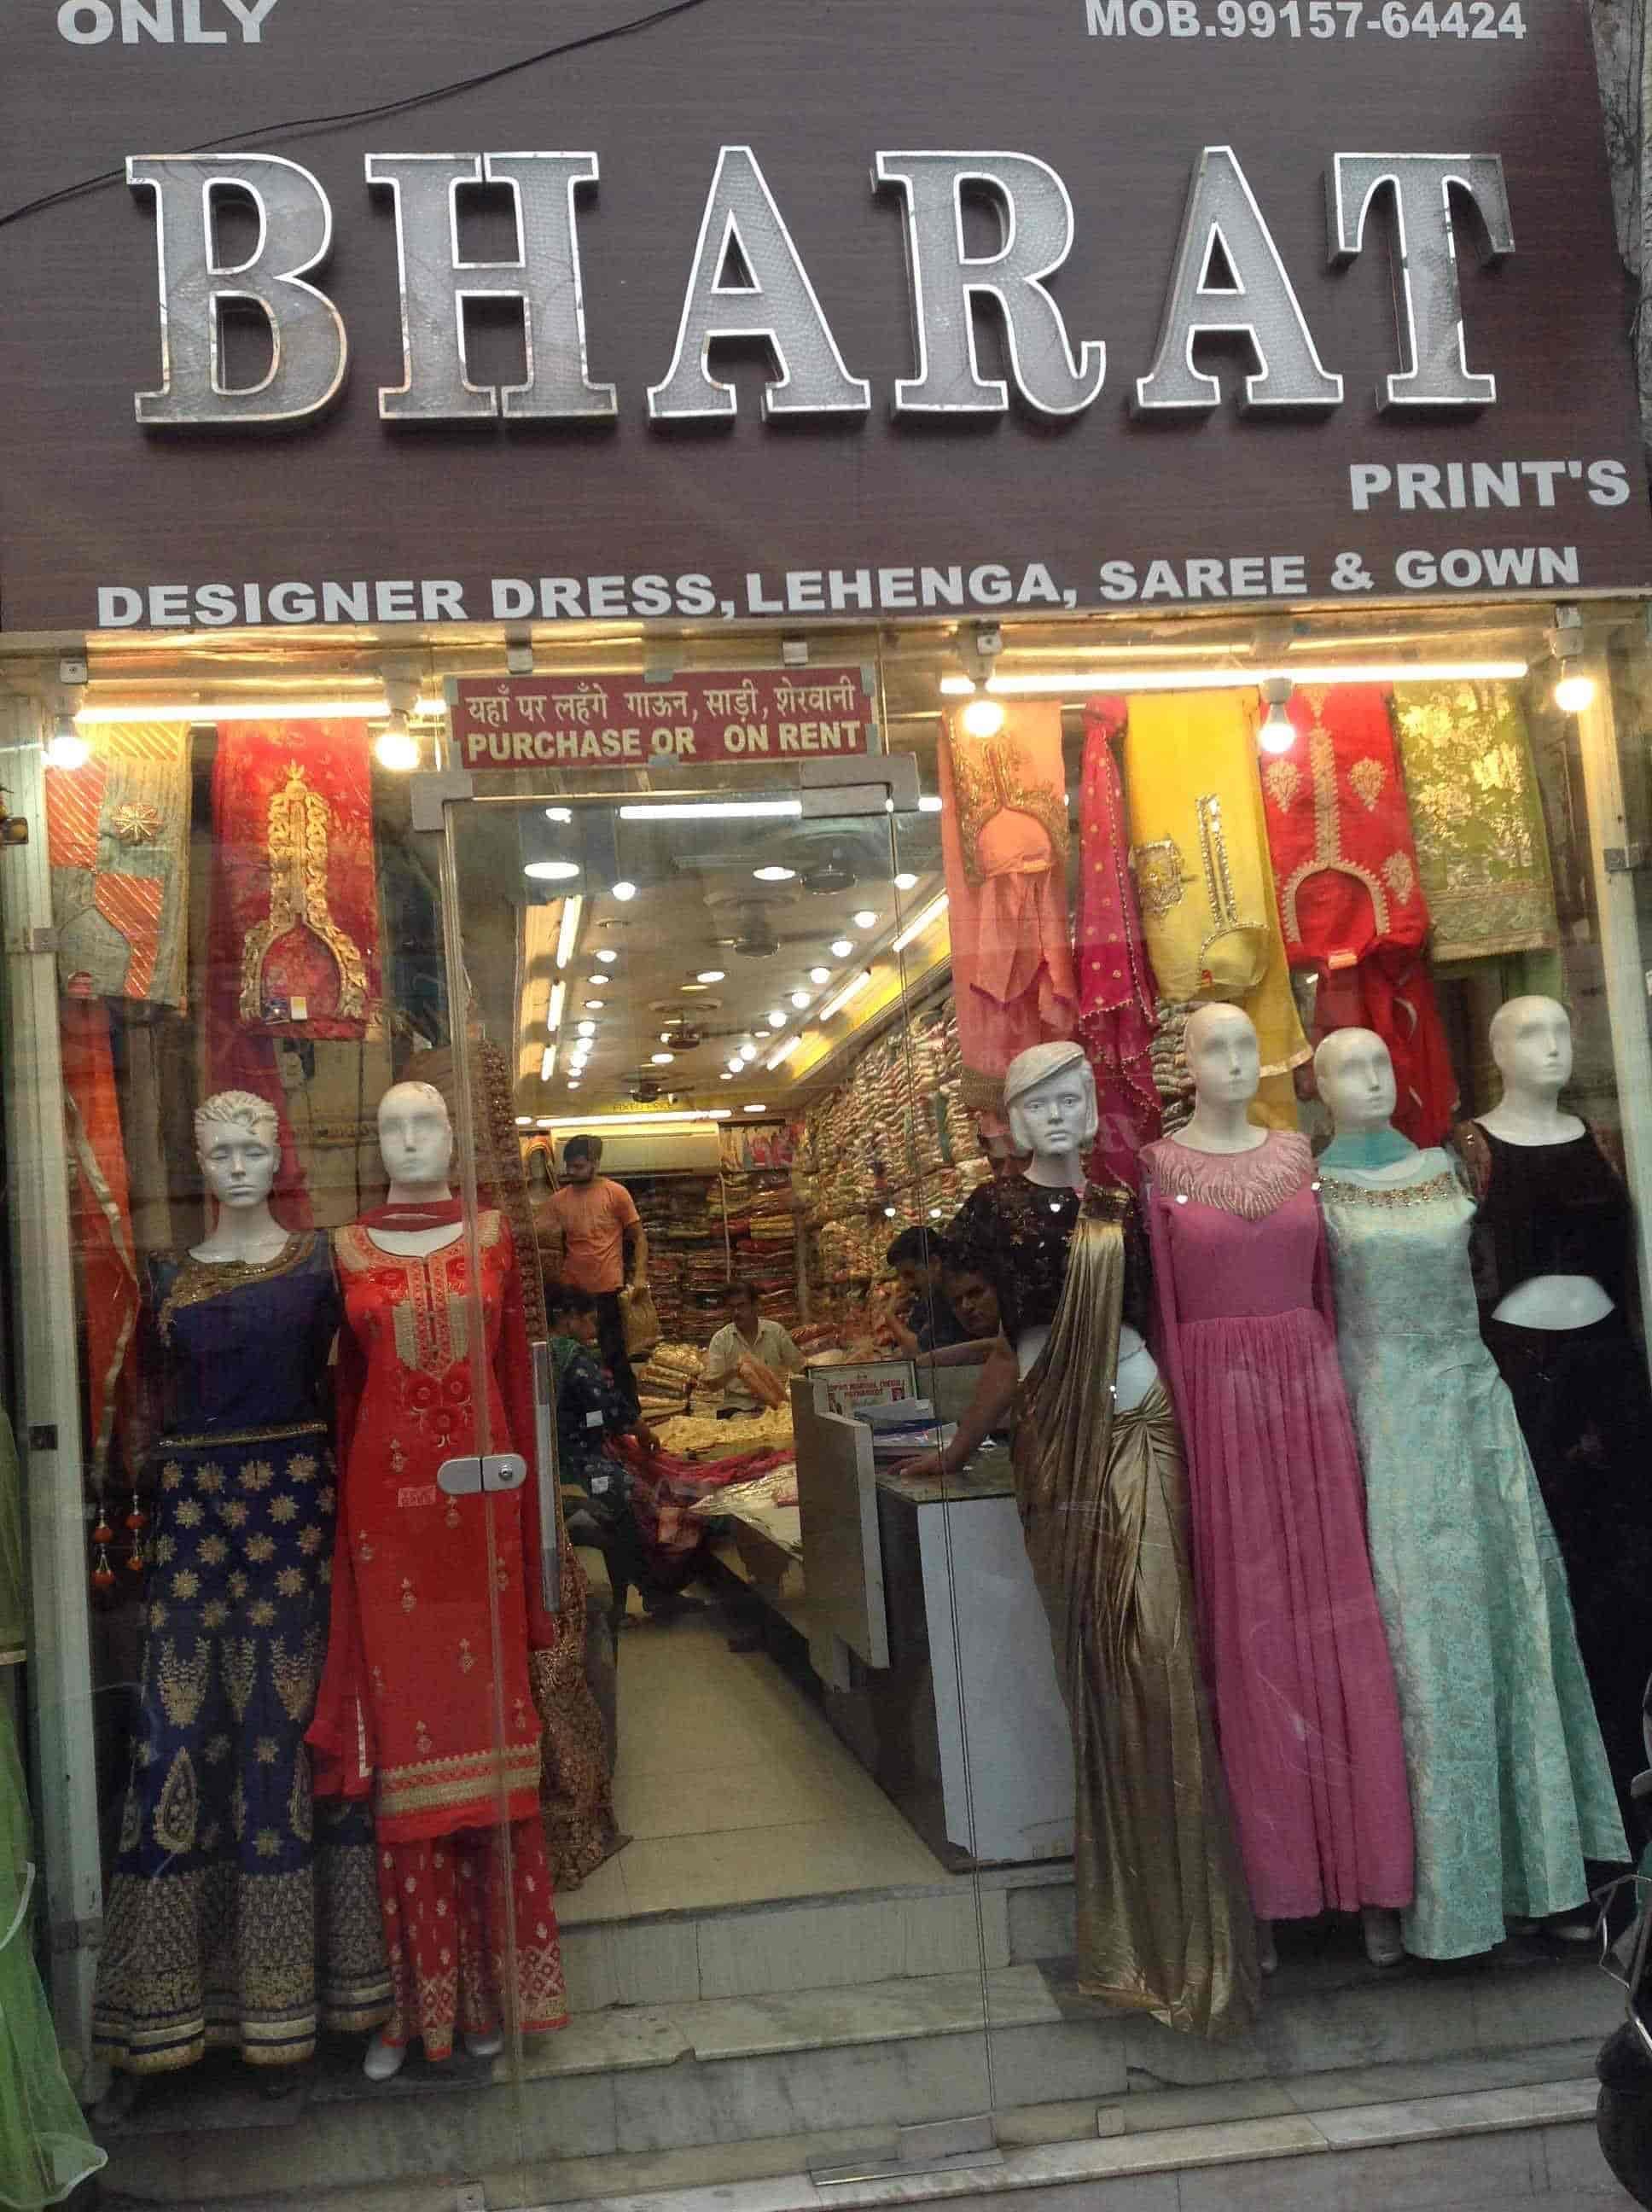 af8f74838e Only Bharat Prints Bharat Wedding Plaza Bharat Mens Studio, Main Bazar,  Near Post Office Chowk - Fashion Designer For Women Wear in Pathankot -  Justdial